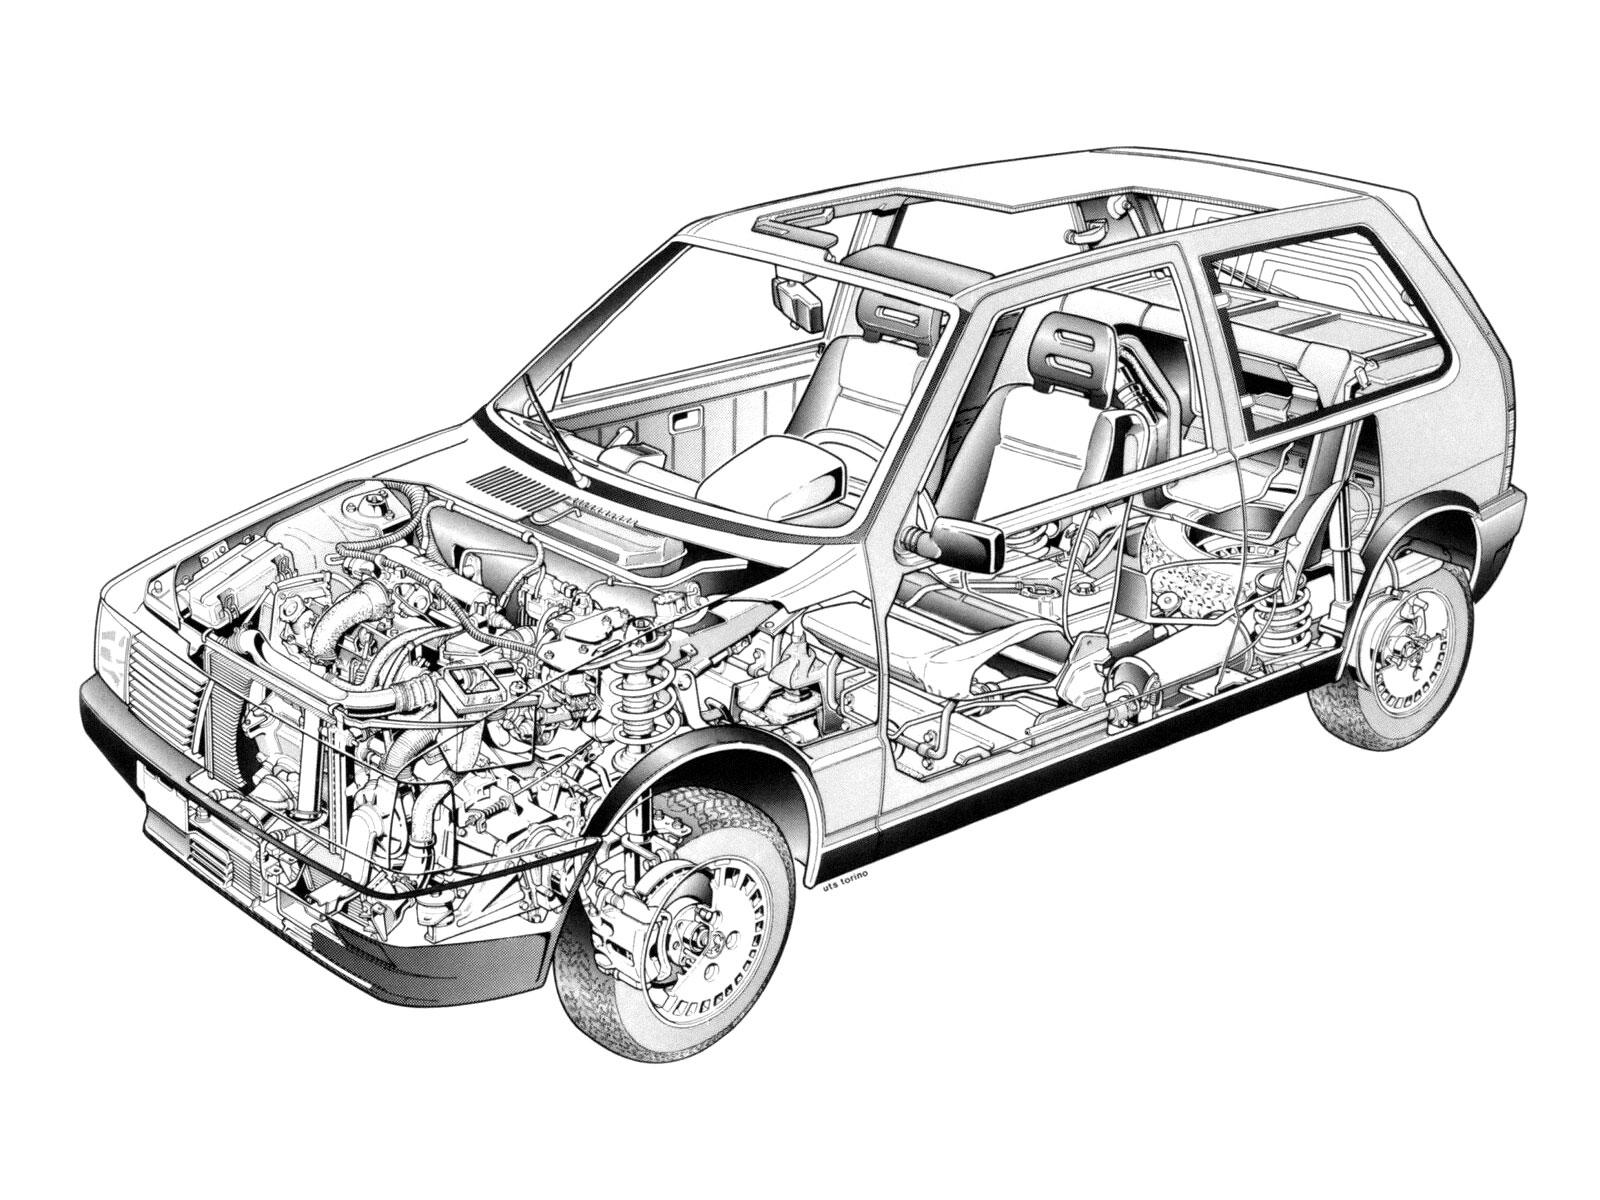 Fiat Uno Turbo cutaway drawing